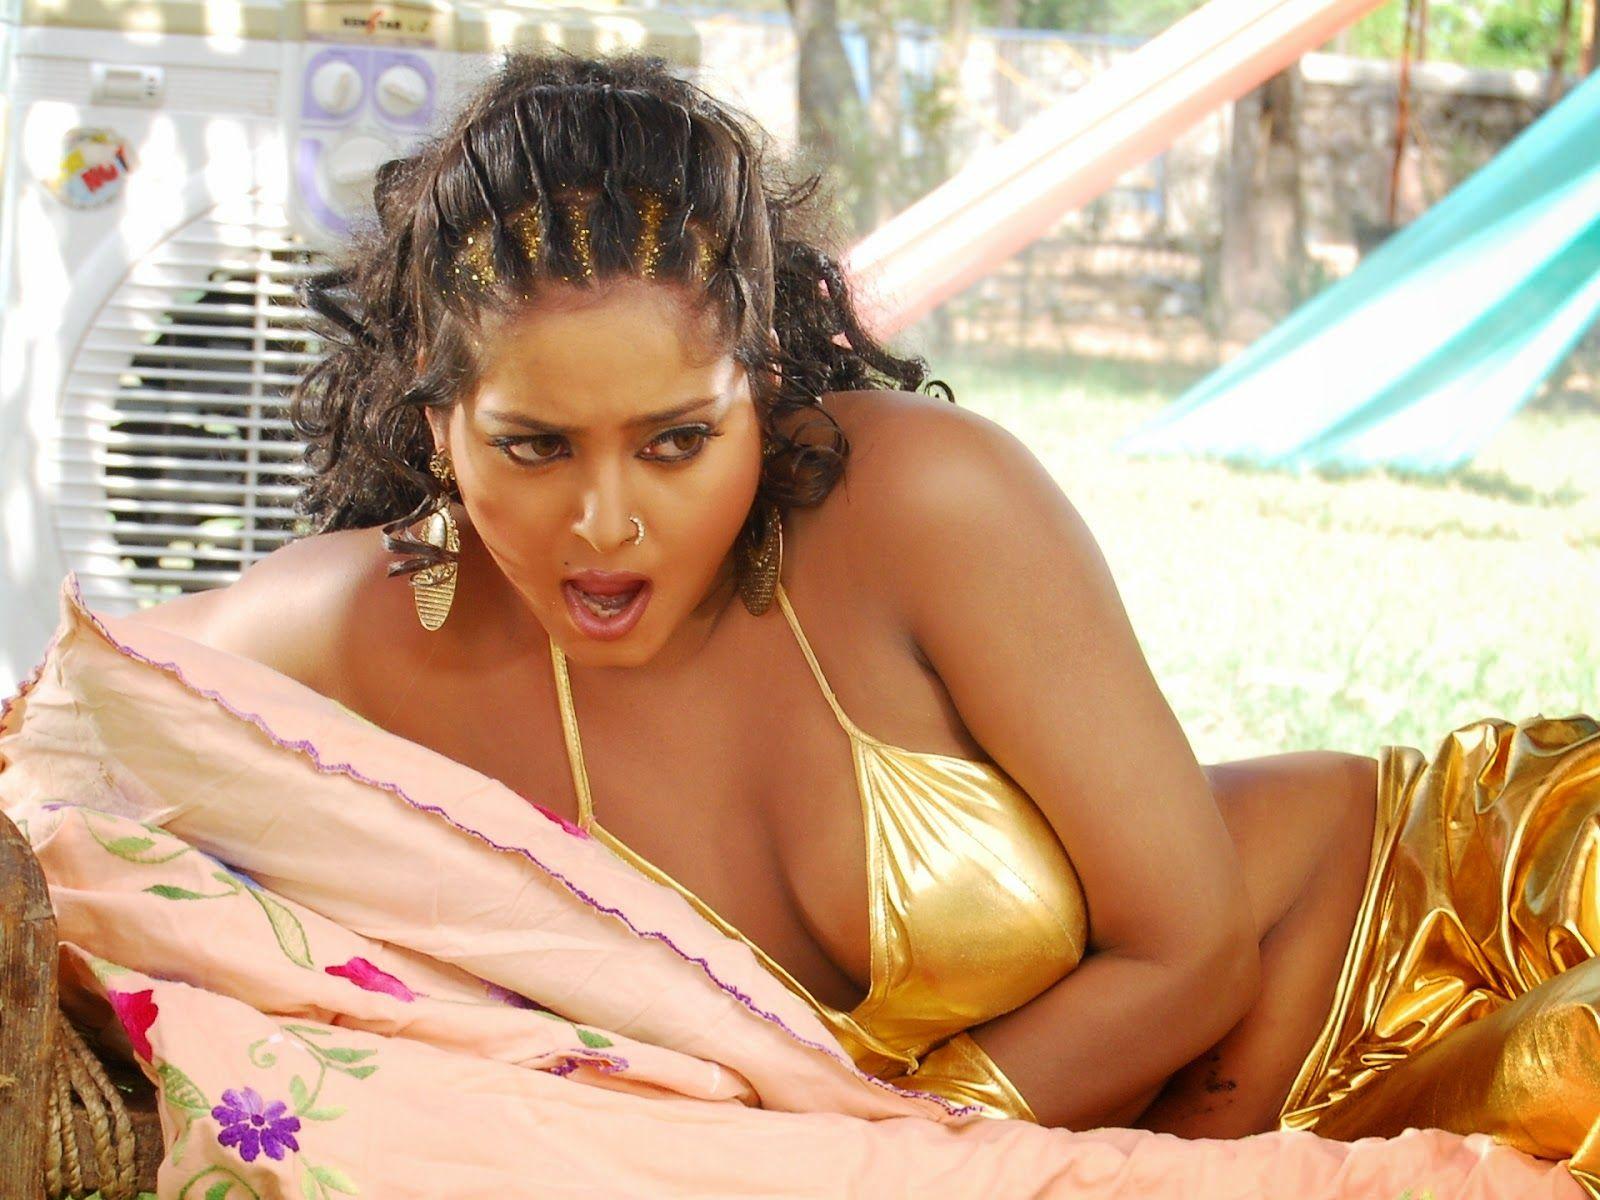 Bhojpuri Hot Actress Pic, Bhojpuri Item Girls Pic